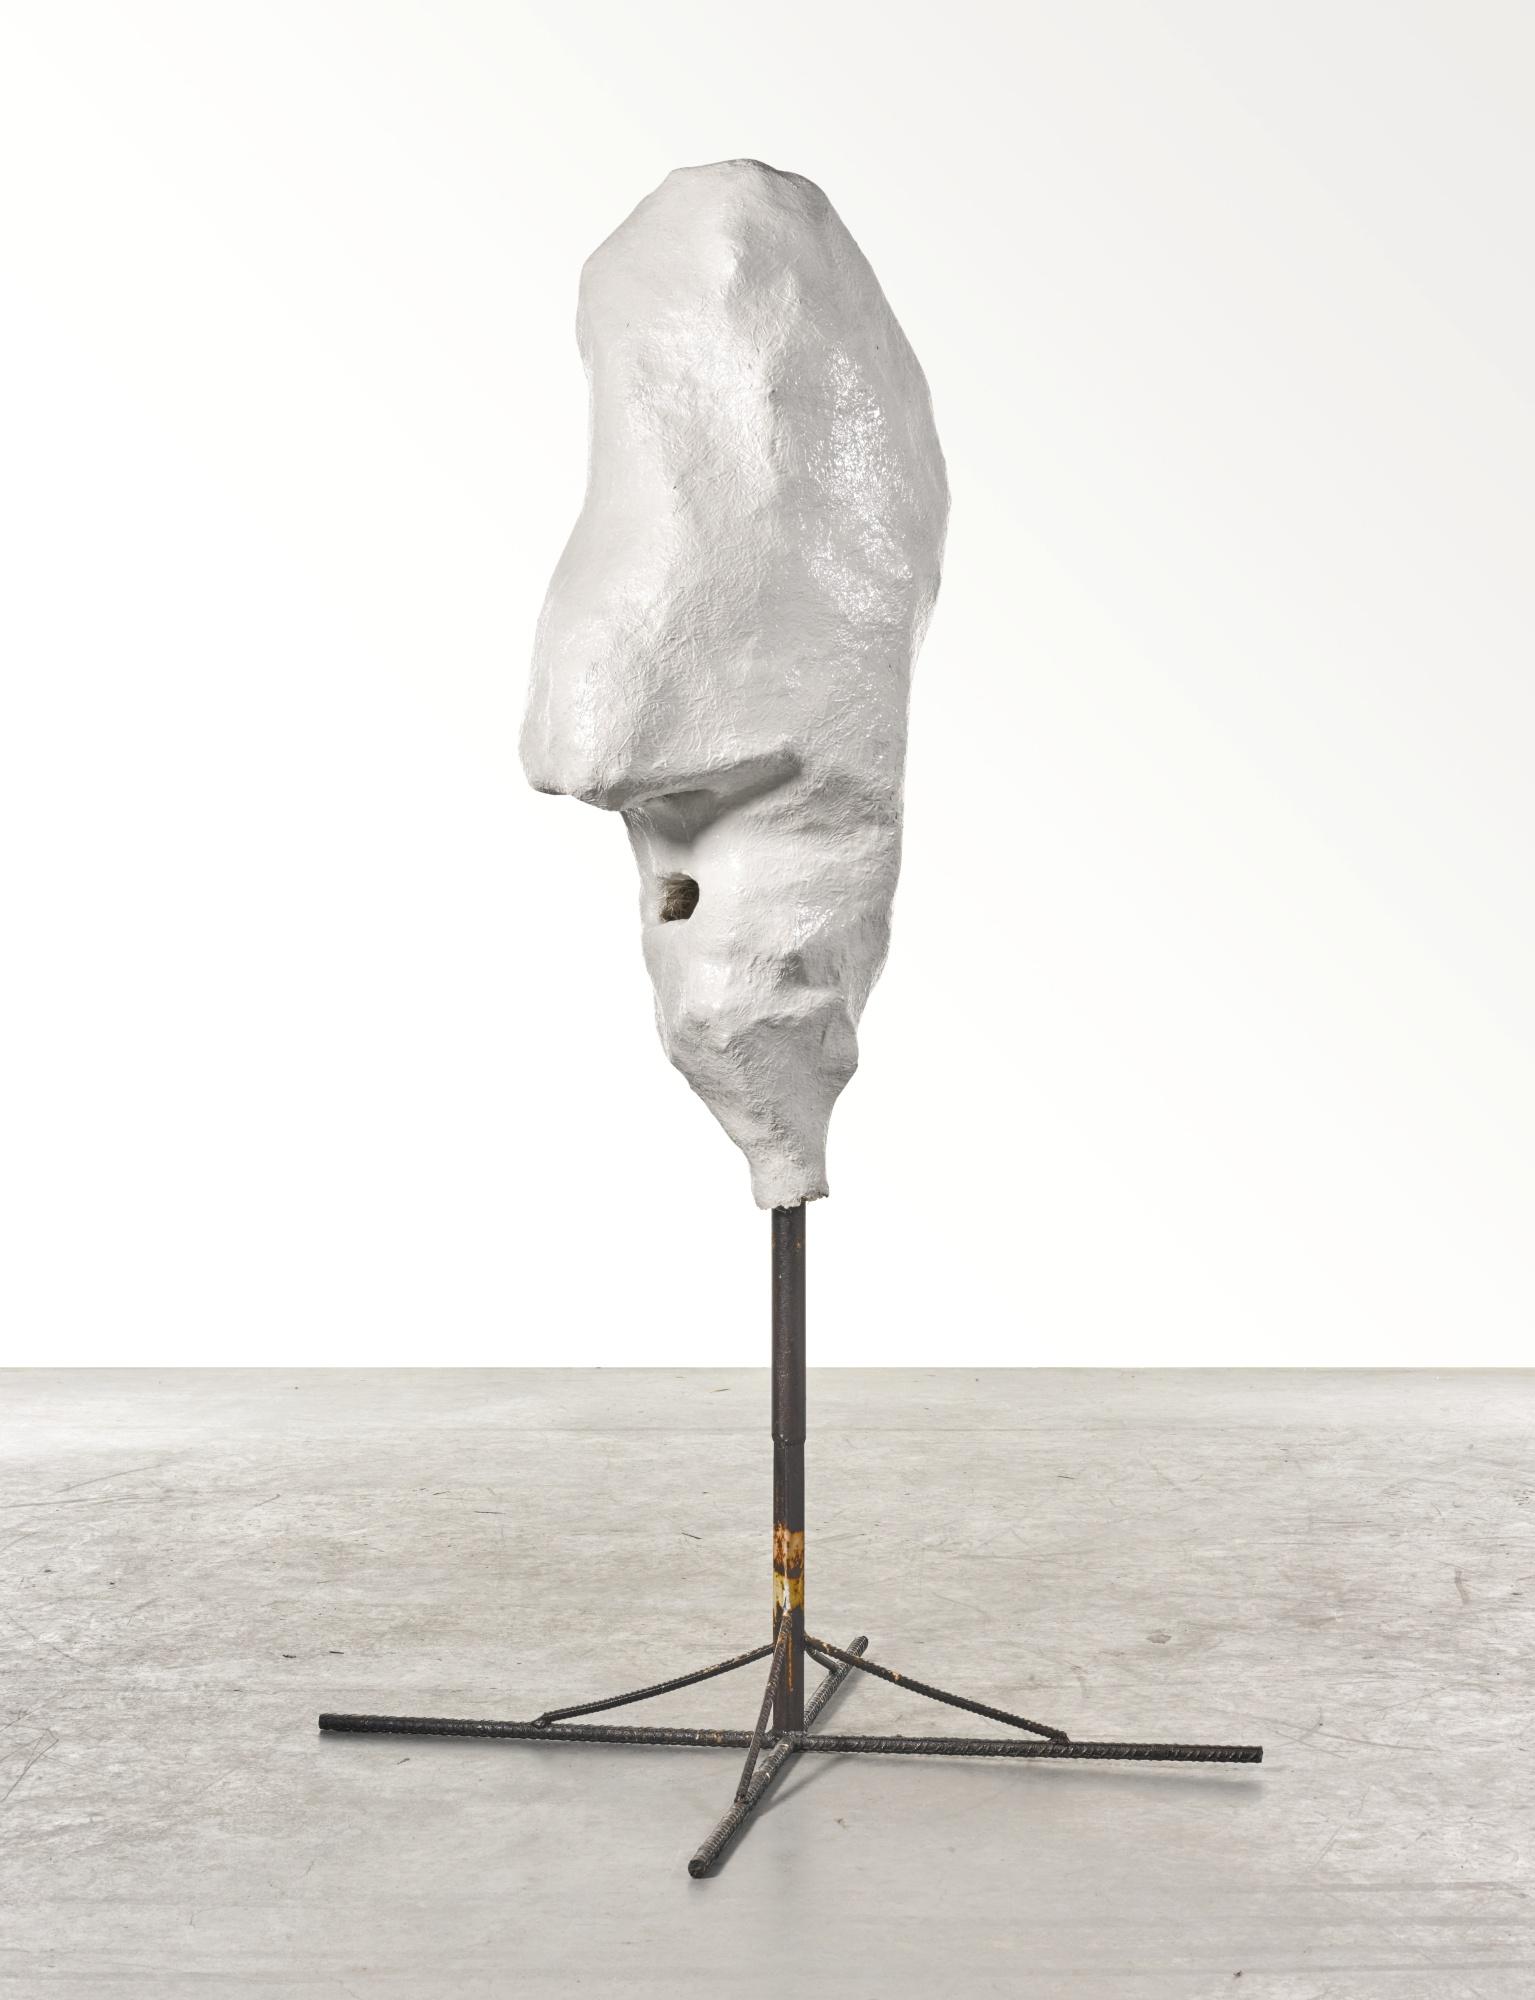 Franz West-Lemurenkopf (Model For Knokke)-2002